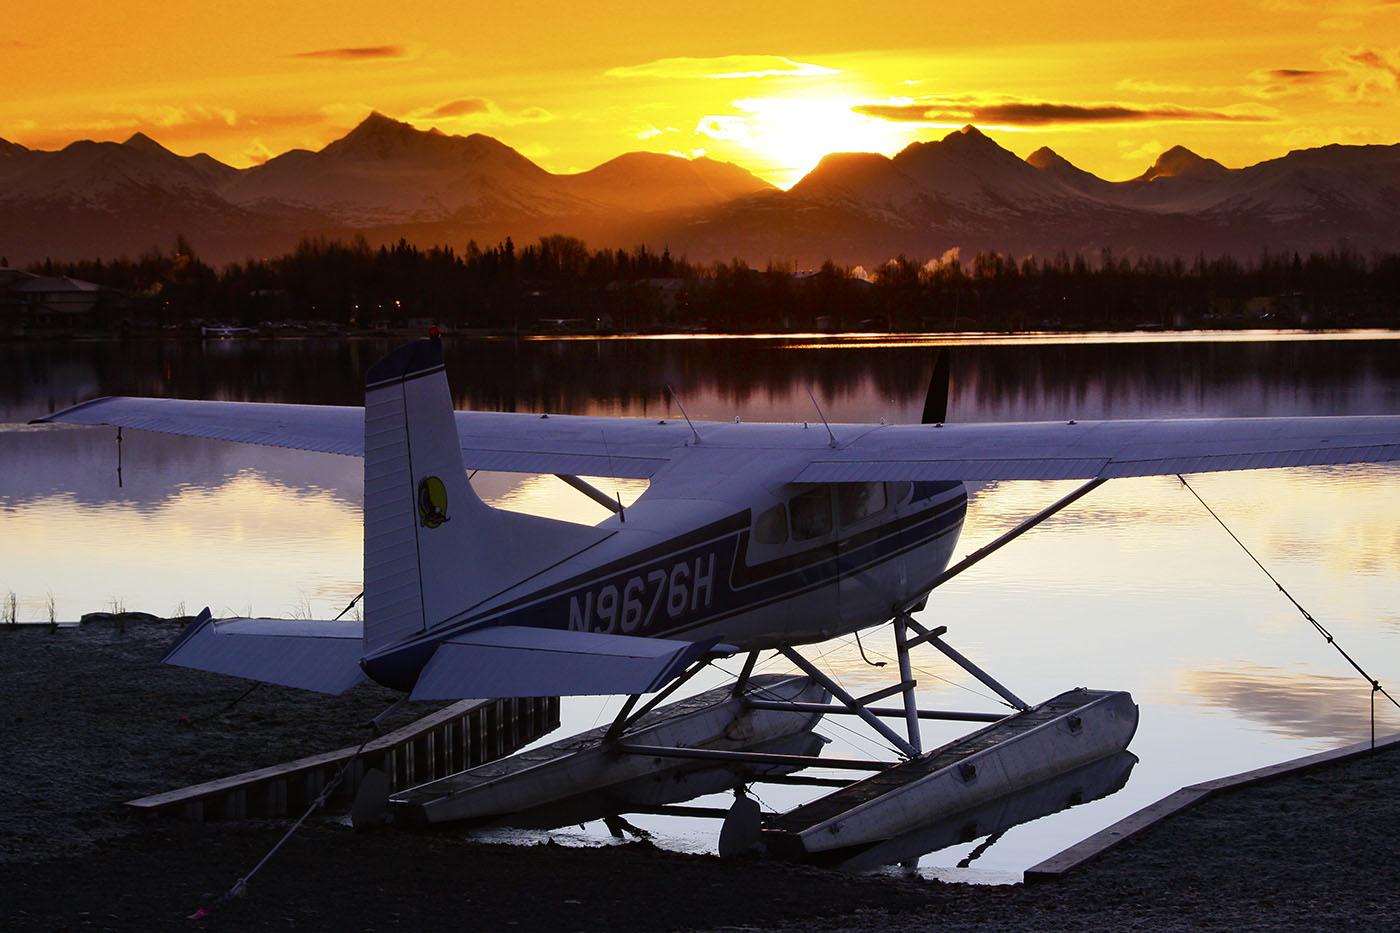 Best Alaska Aircraft Photogrpahy- Alaskafoto |Environmental portrait & portrait photographers